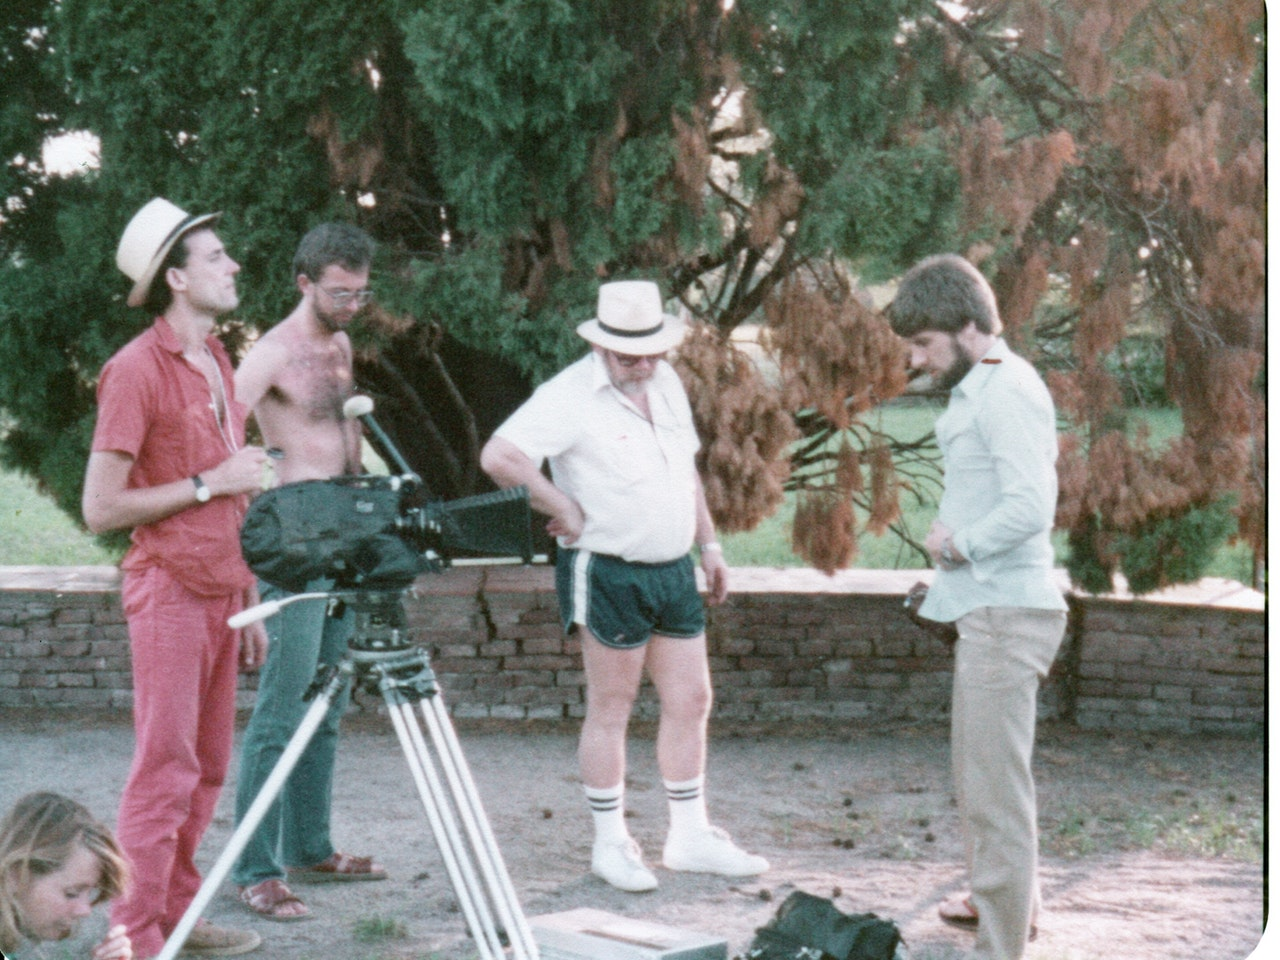 BORGES & I MIKE SOUTHON:JO SHEARER:RICKIE GAULD:JOHN HOOPER (SOUND)BBC FEB 1983 URUGUAY